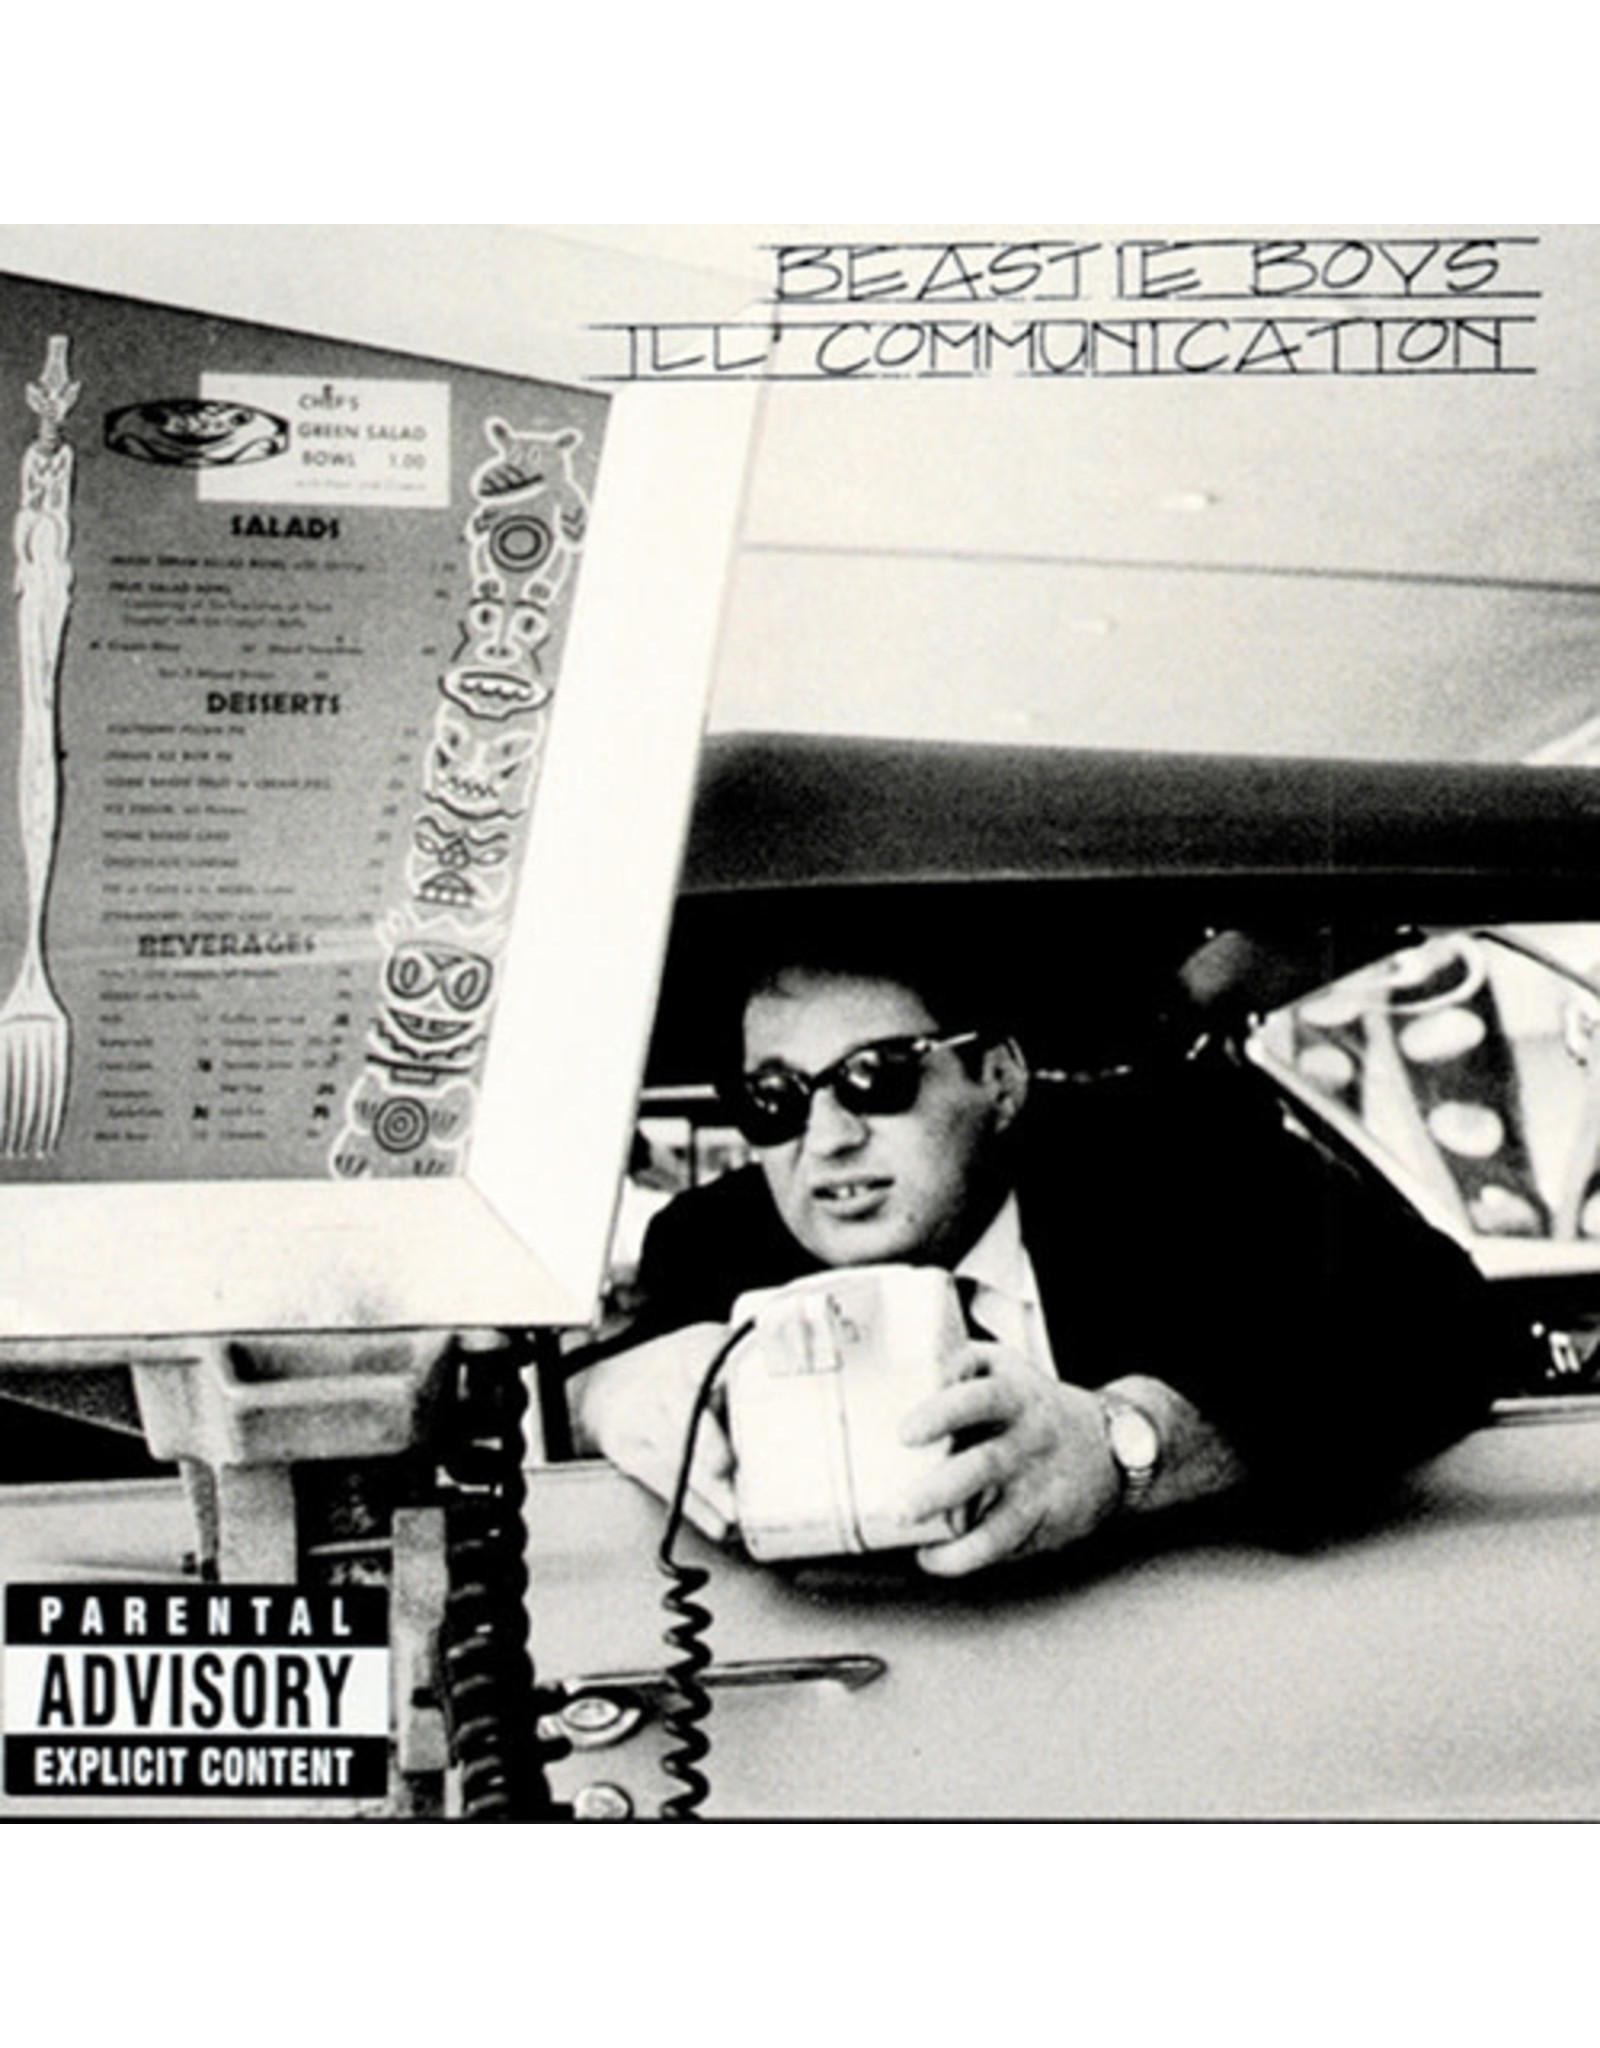 Capitol Beastie Boys: Ill Communication LP